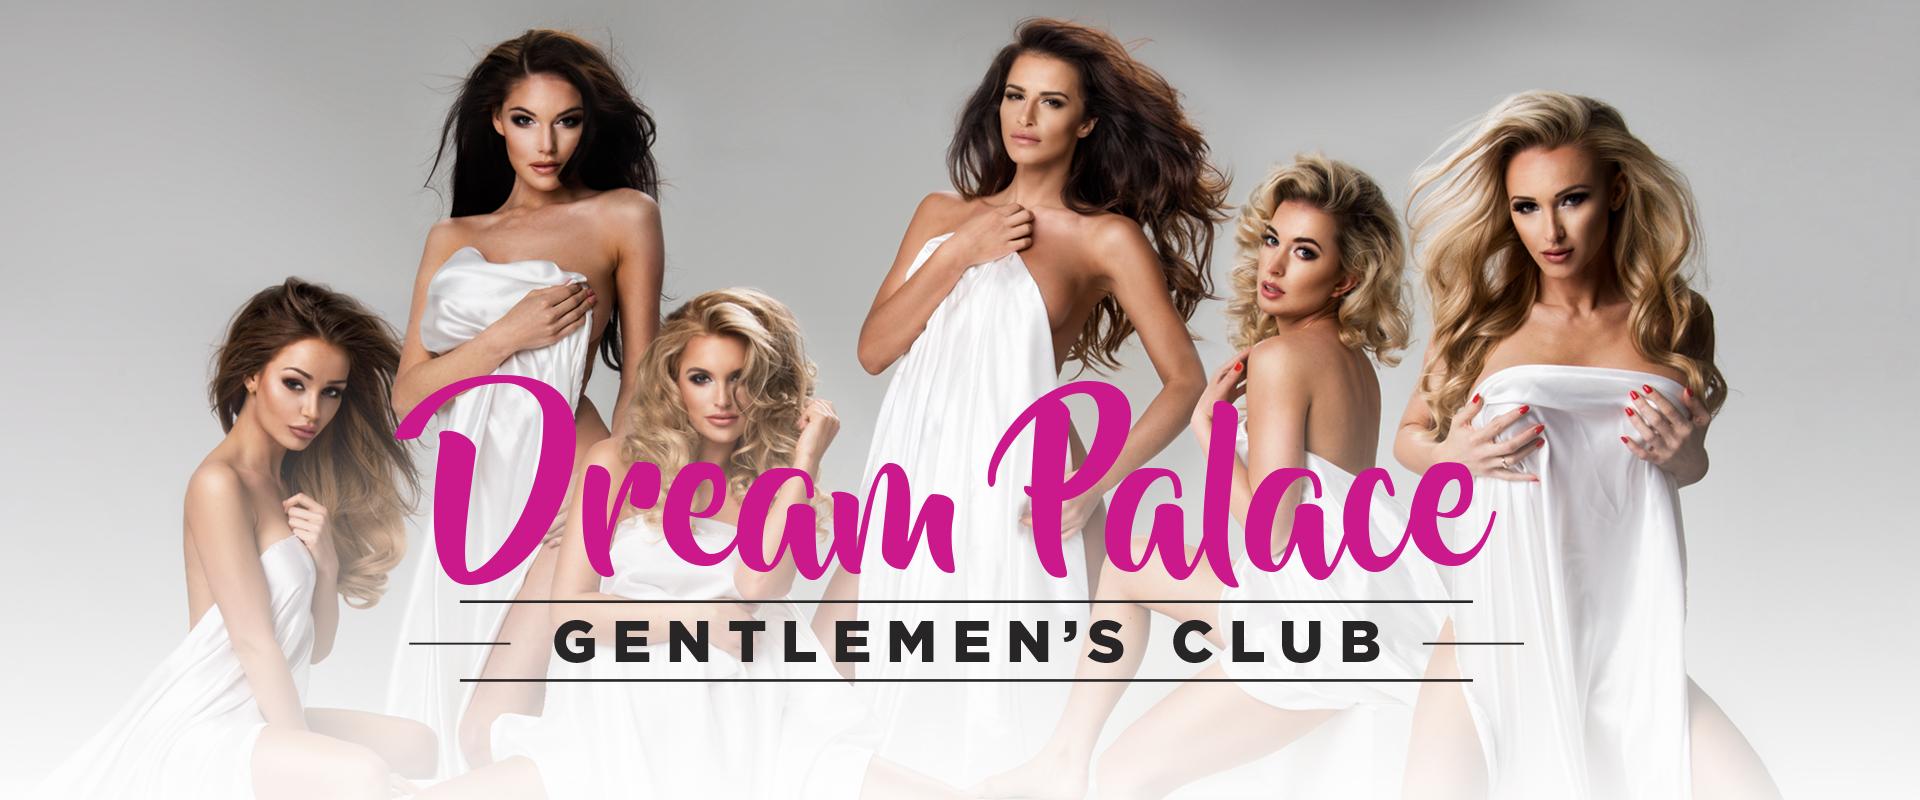 Dream Palace Gentlemens Club 815 N Scottsdale Rd, Tempe, AZ 85281 (480) 921-8870